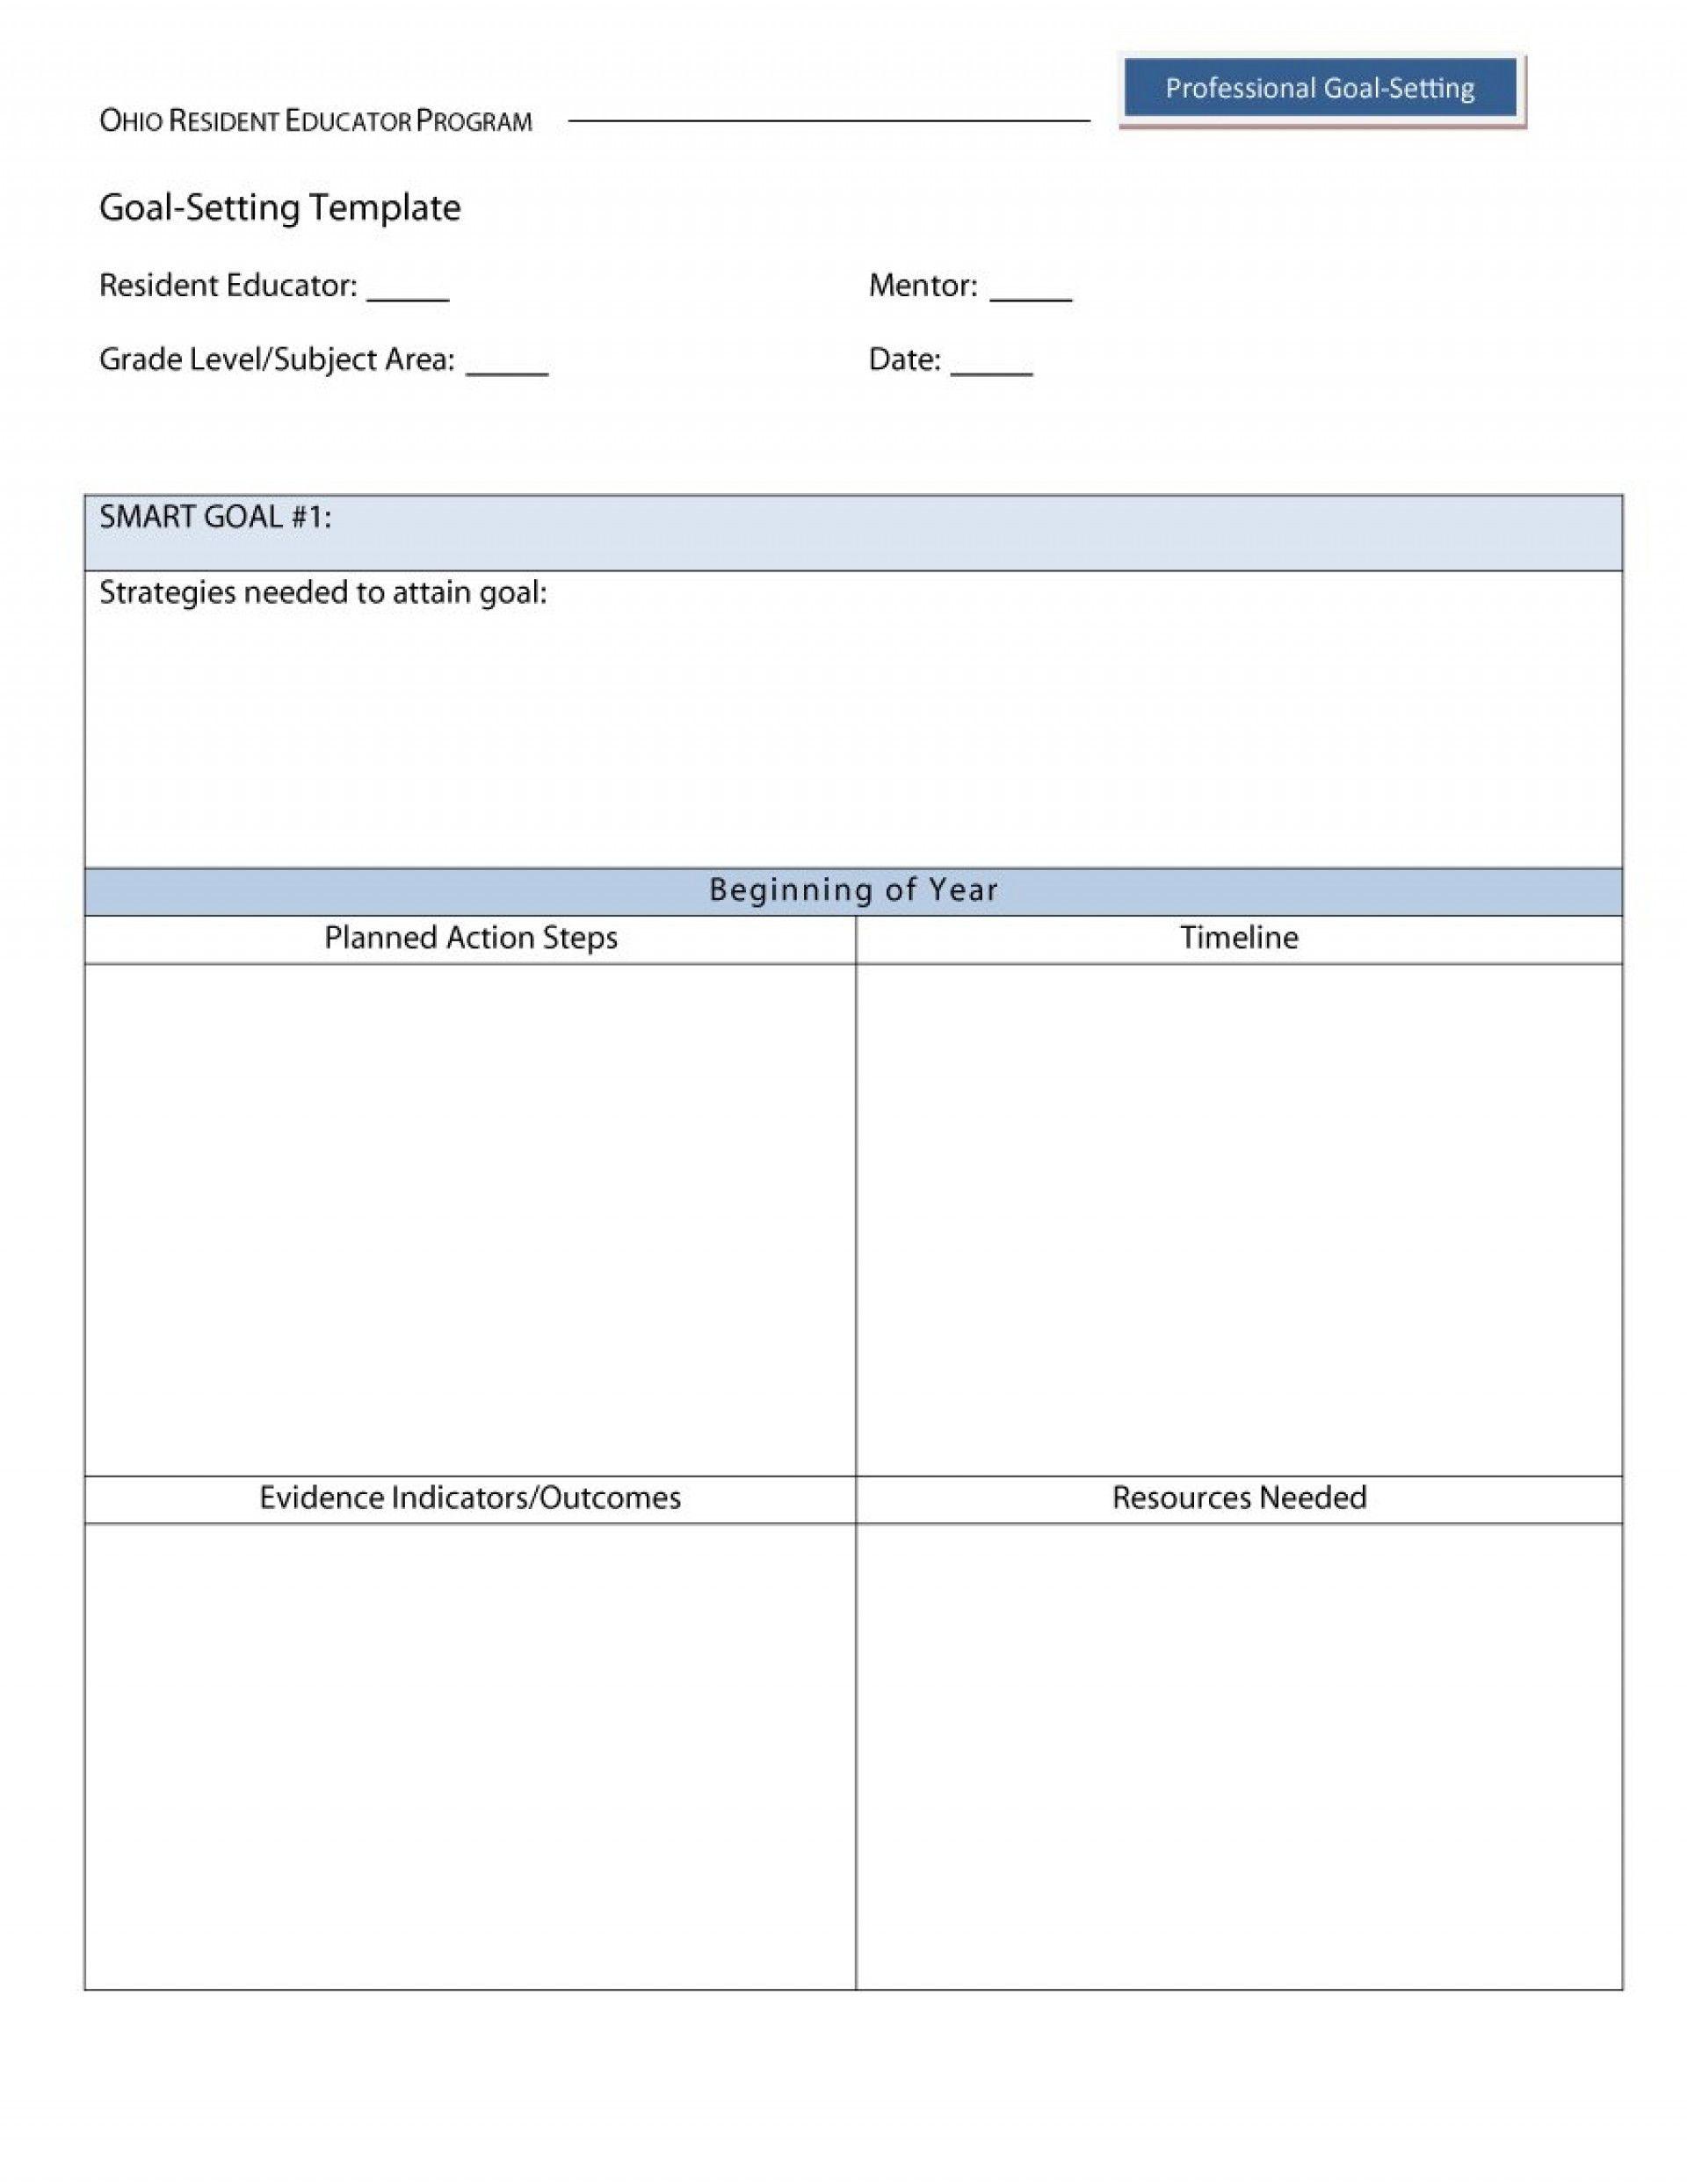 Smart Goals Worksheet 2 Smart goals worksheet, Goals